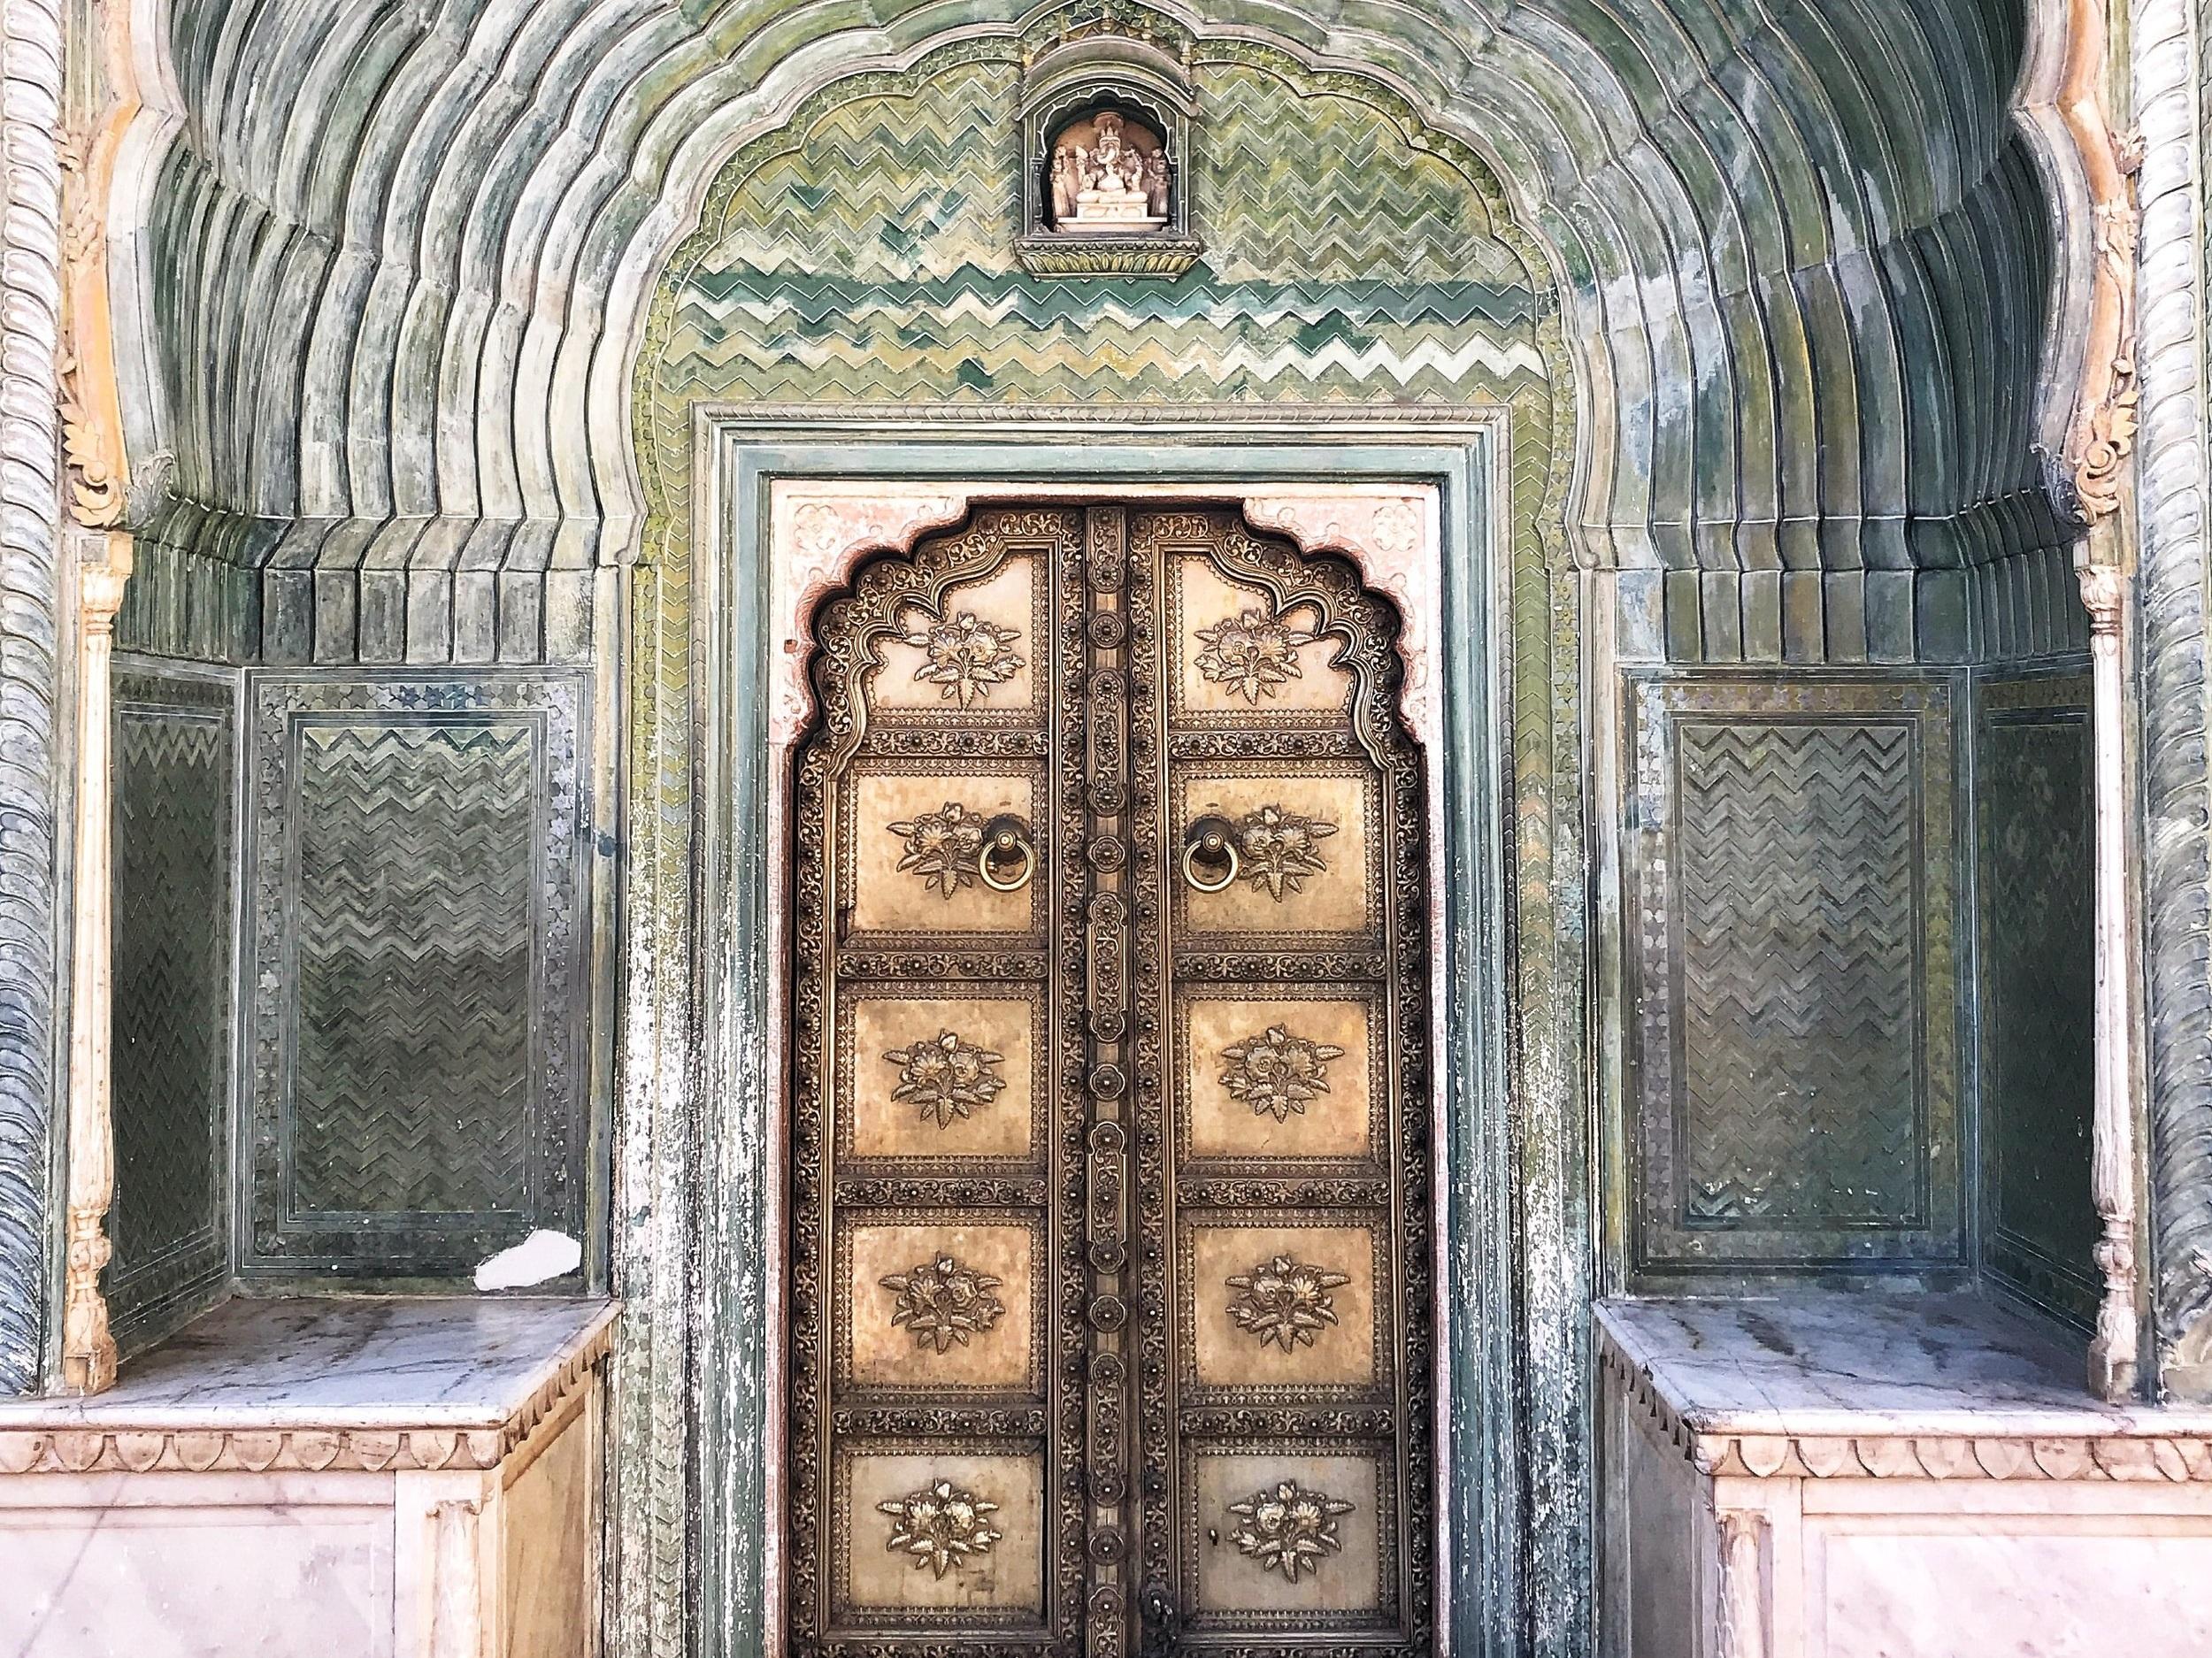 anubhav-arora-WBzlYPYANiA-unsplash.jpg